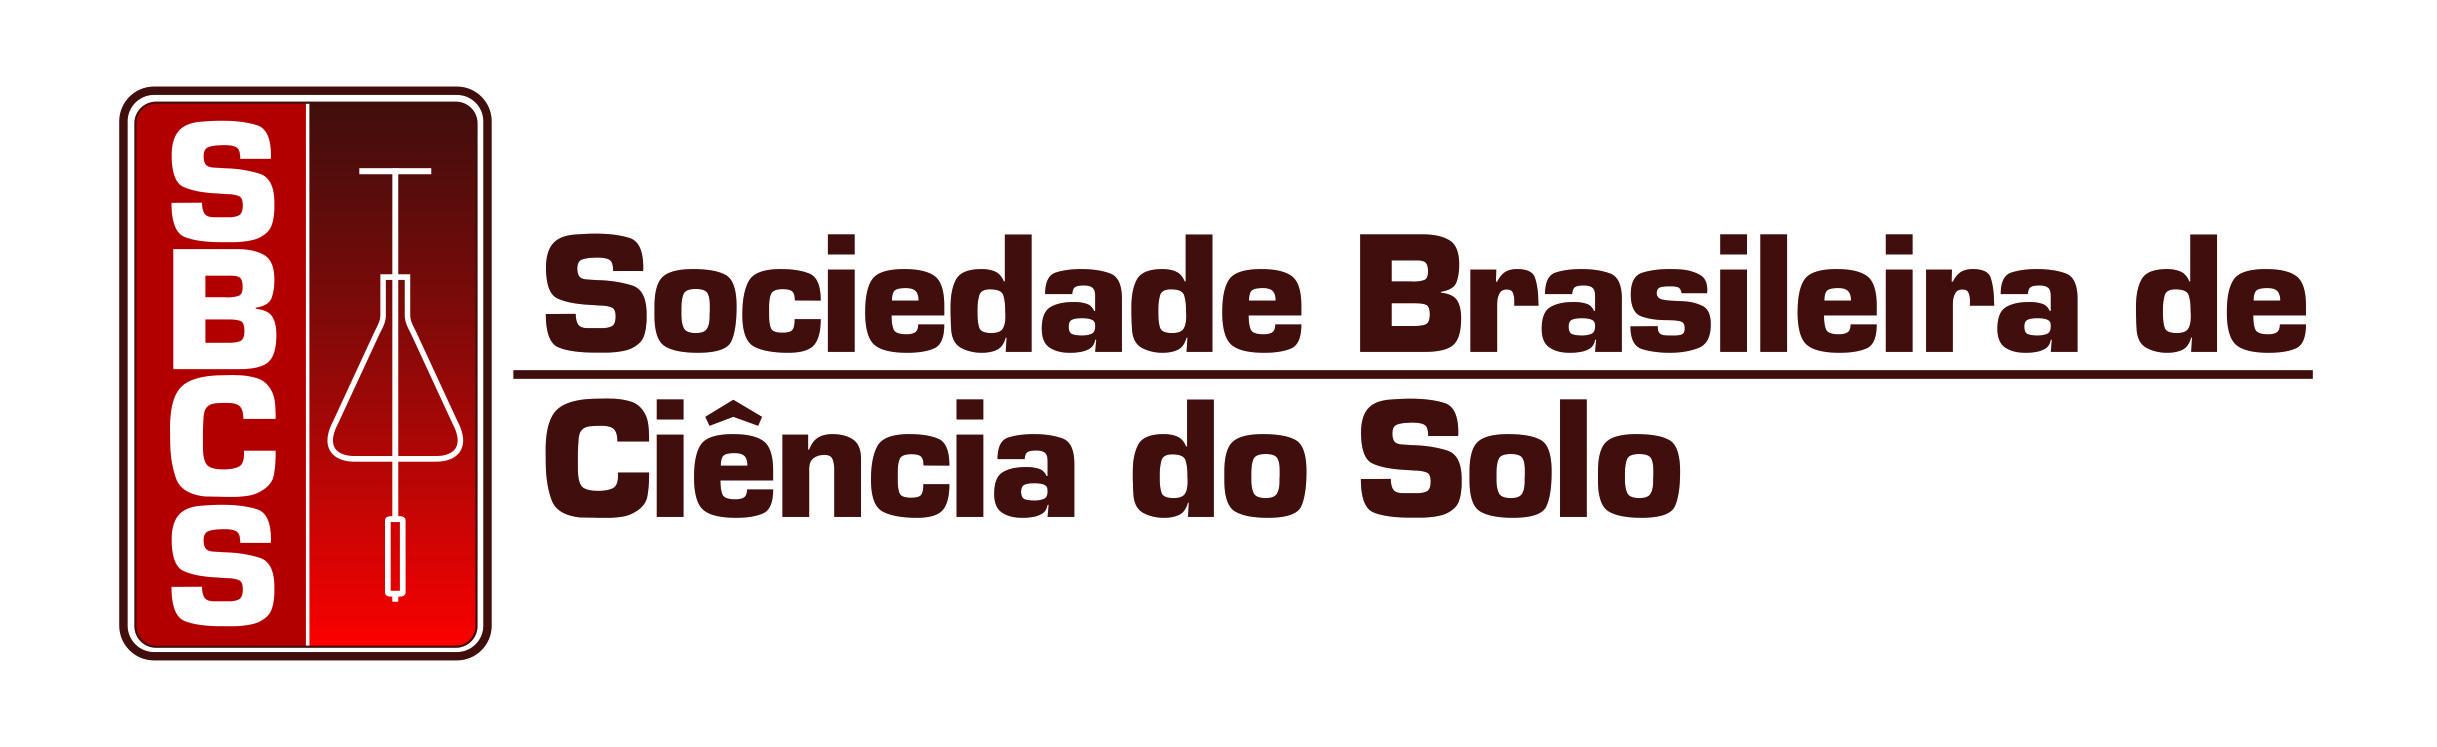 logomarca da sbcs fundo transparente